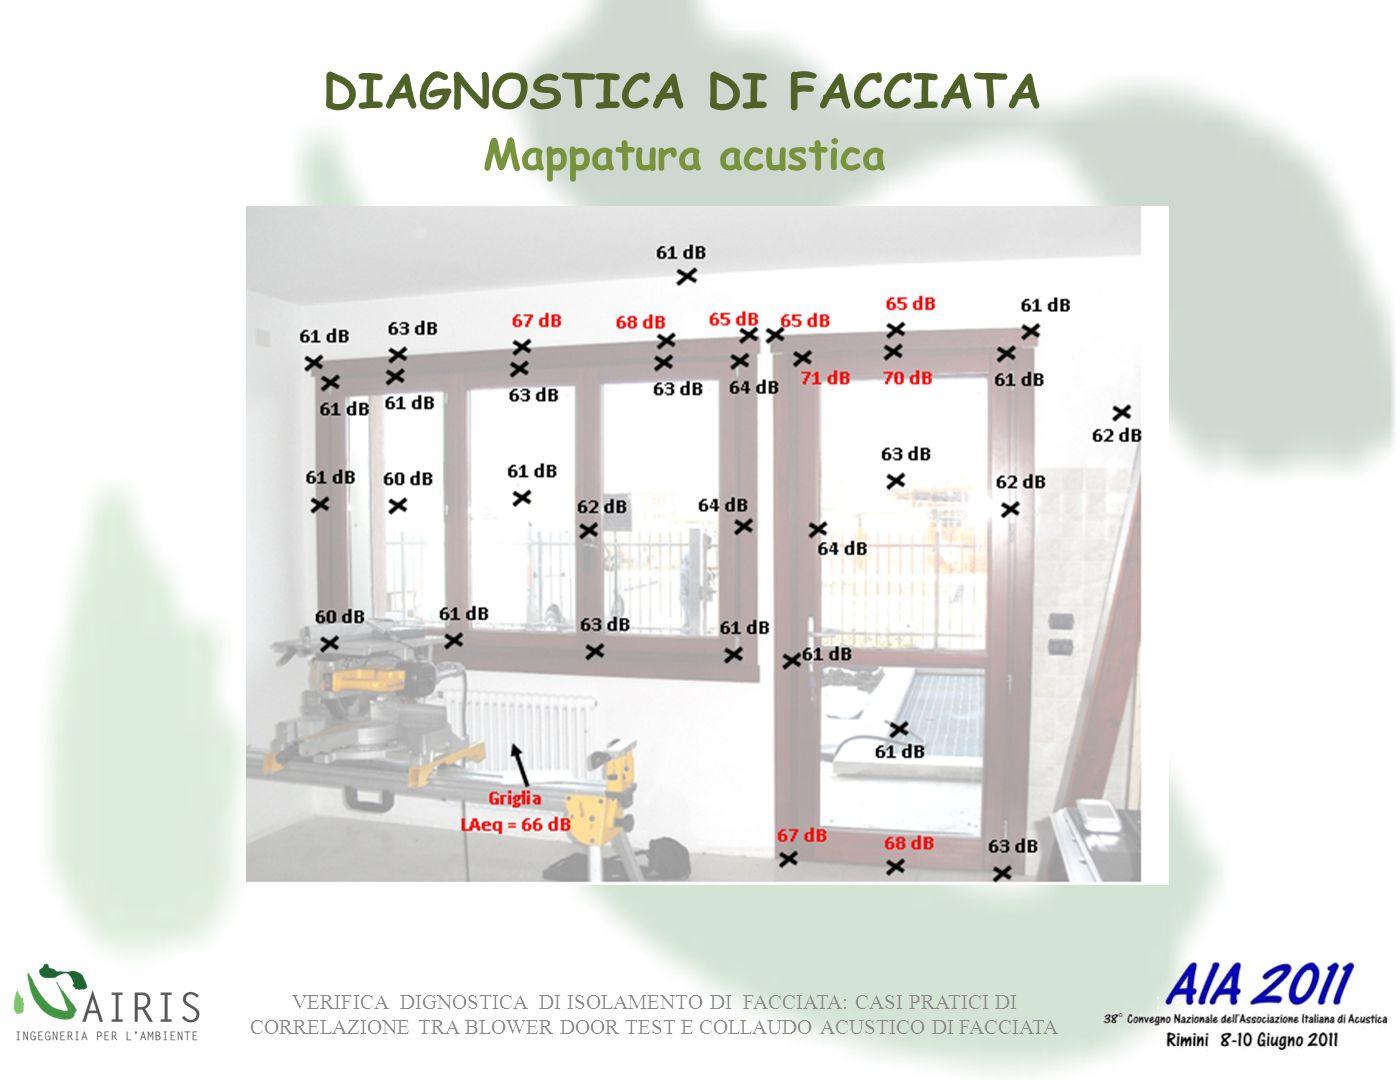 DIAGNOSTICA DI FACCIATA